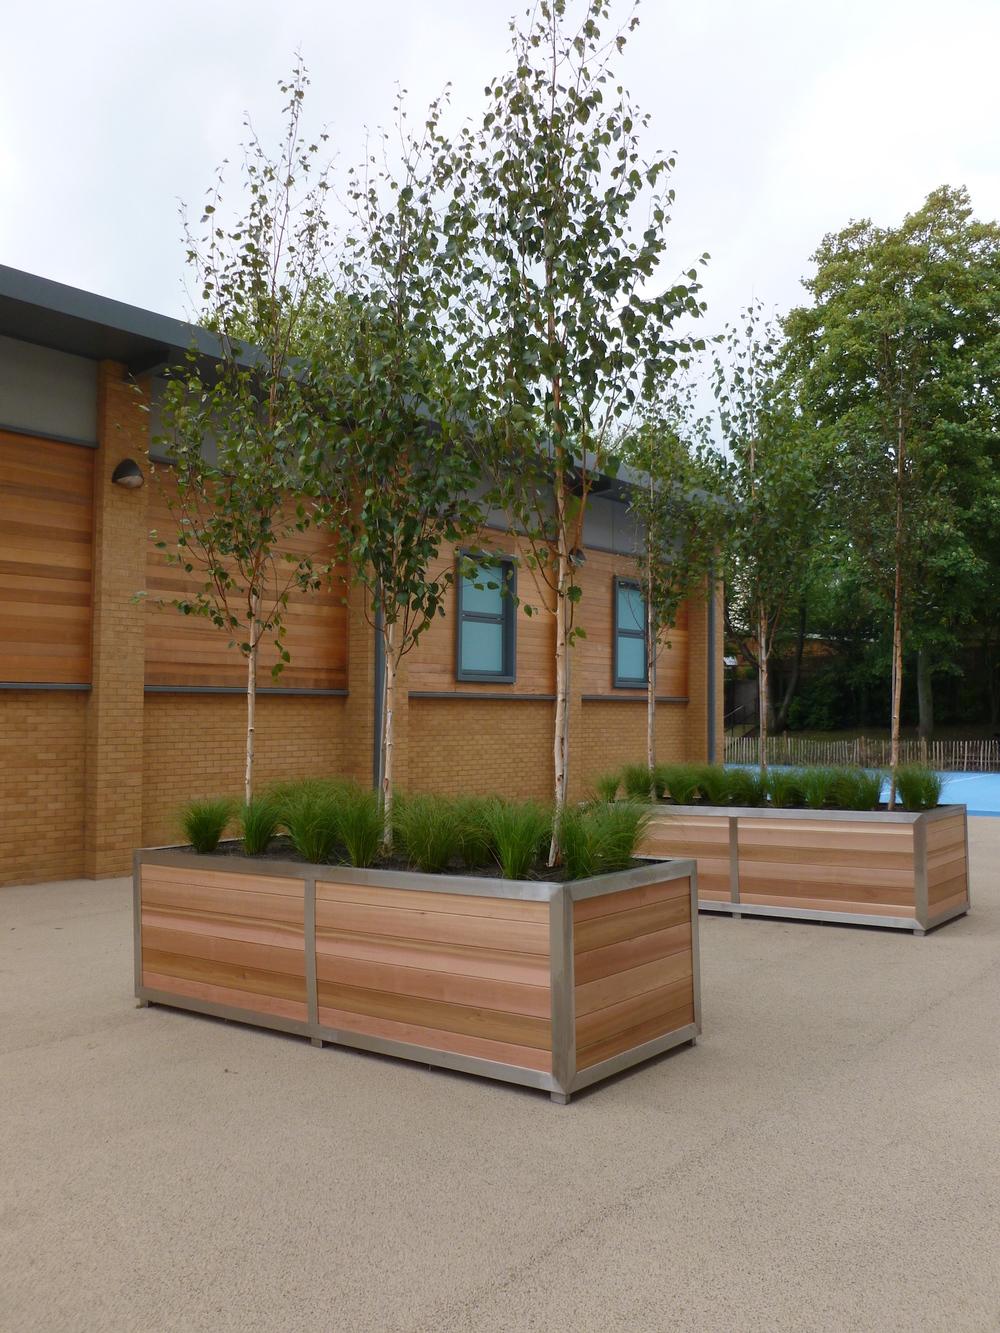 new-bridge-house-plantcare-exterior-plants-trees-bristol-cardiff-image-1